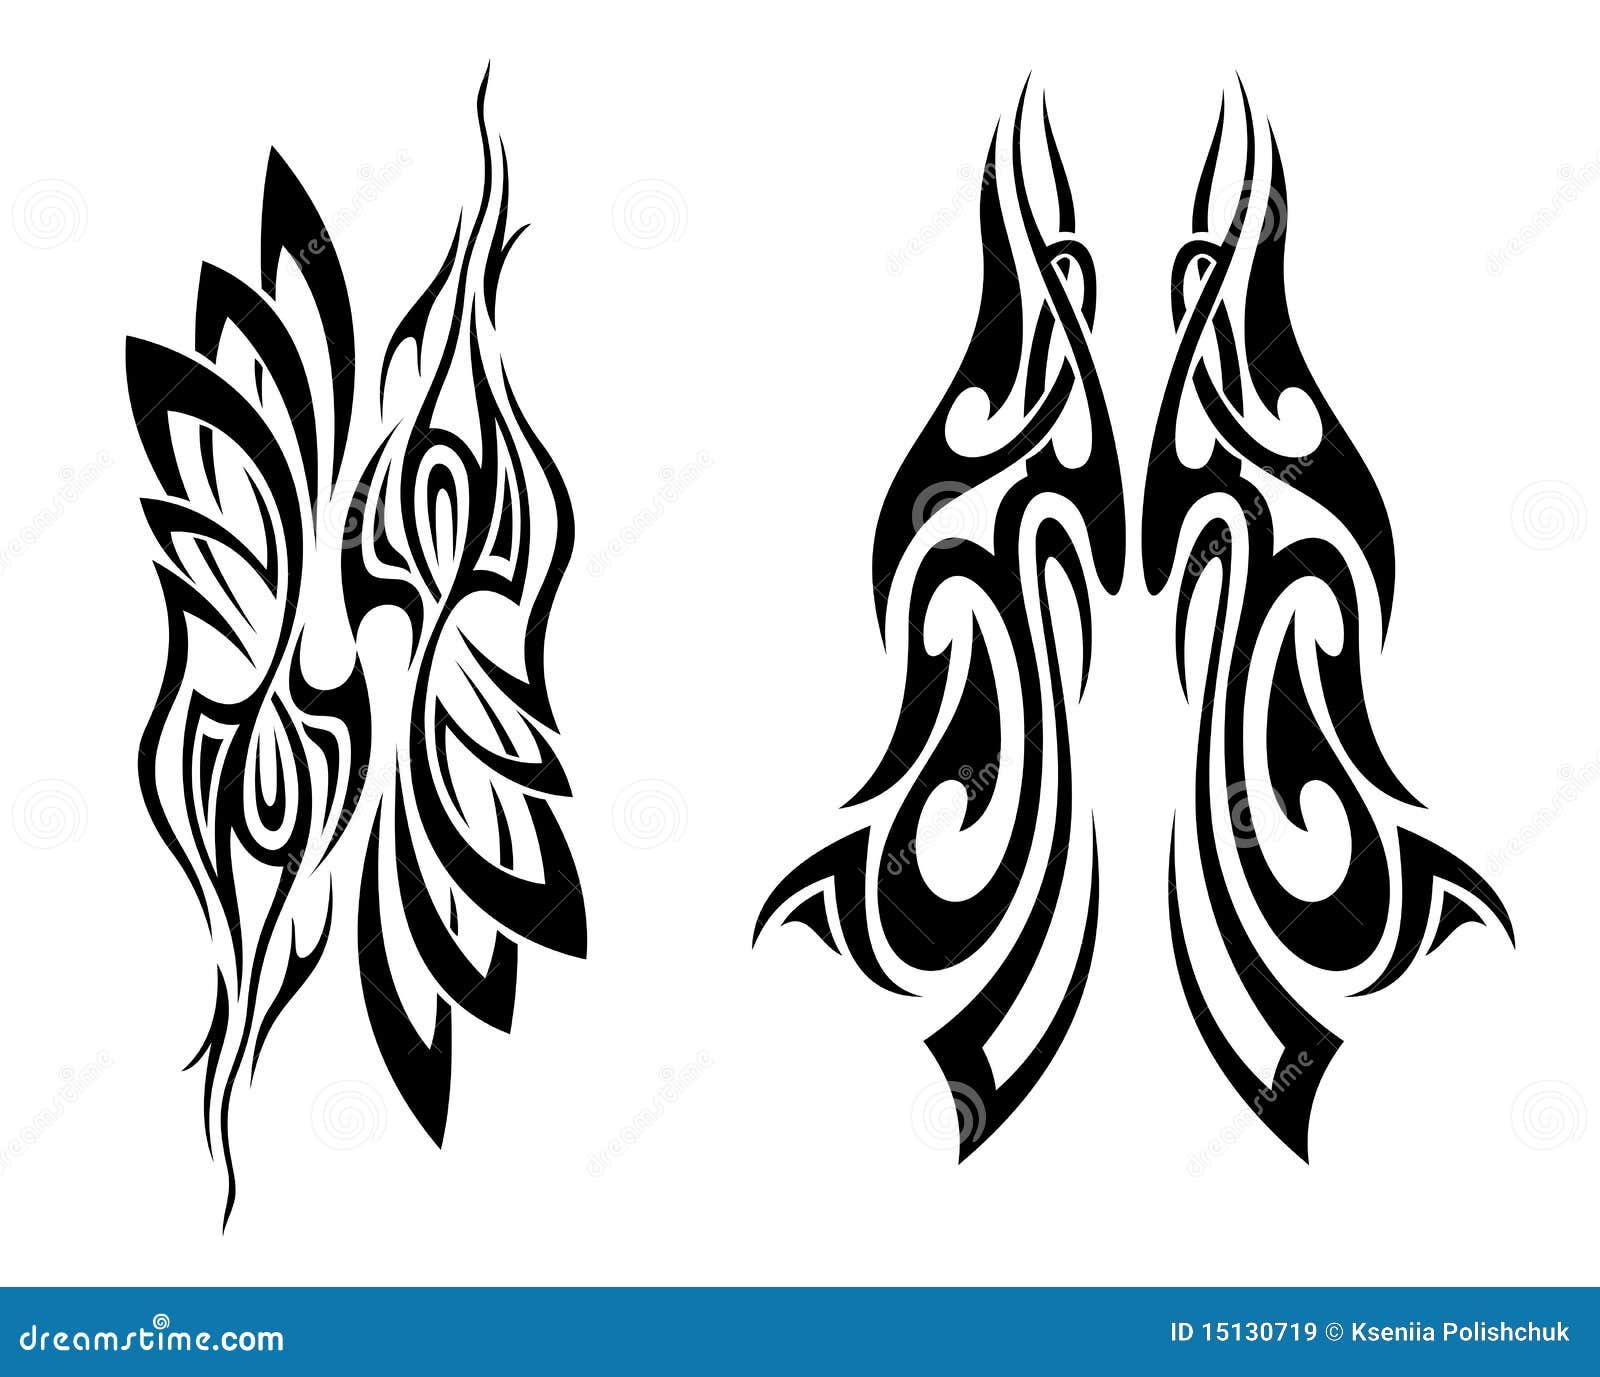 set of tattoo design elements royalty free stock images image 15130719. Black Bedroom Furniture Sets. Home Design Ideas